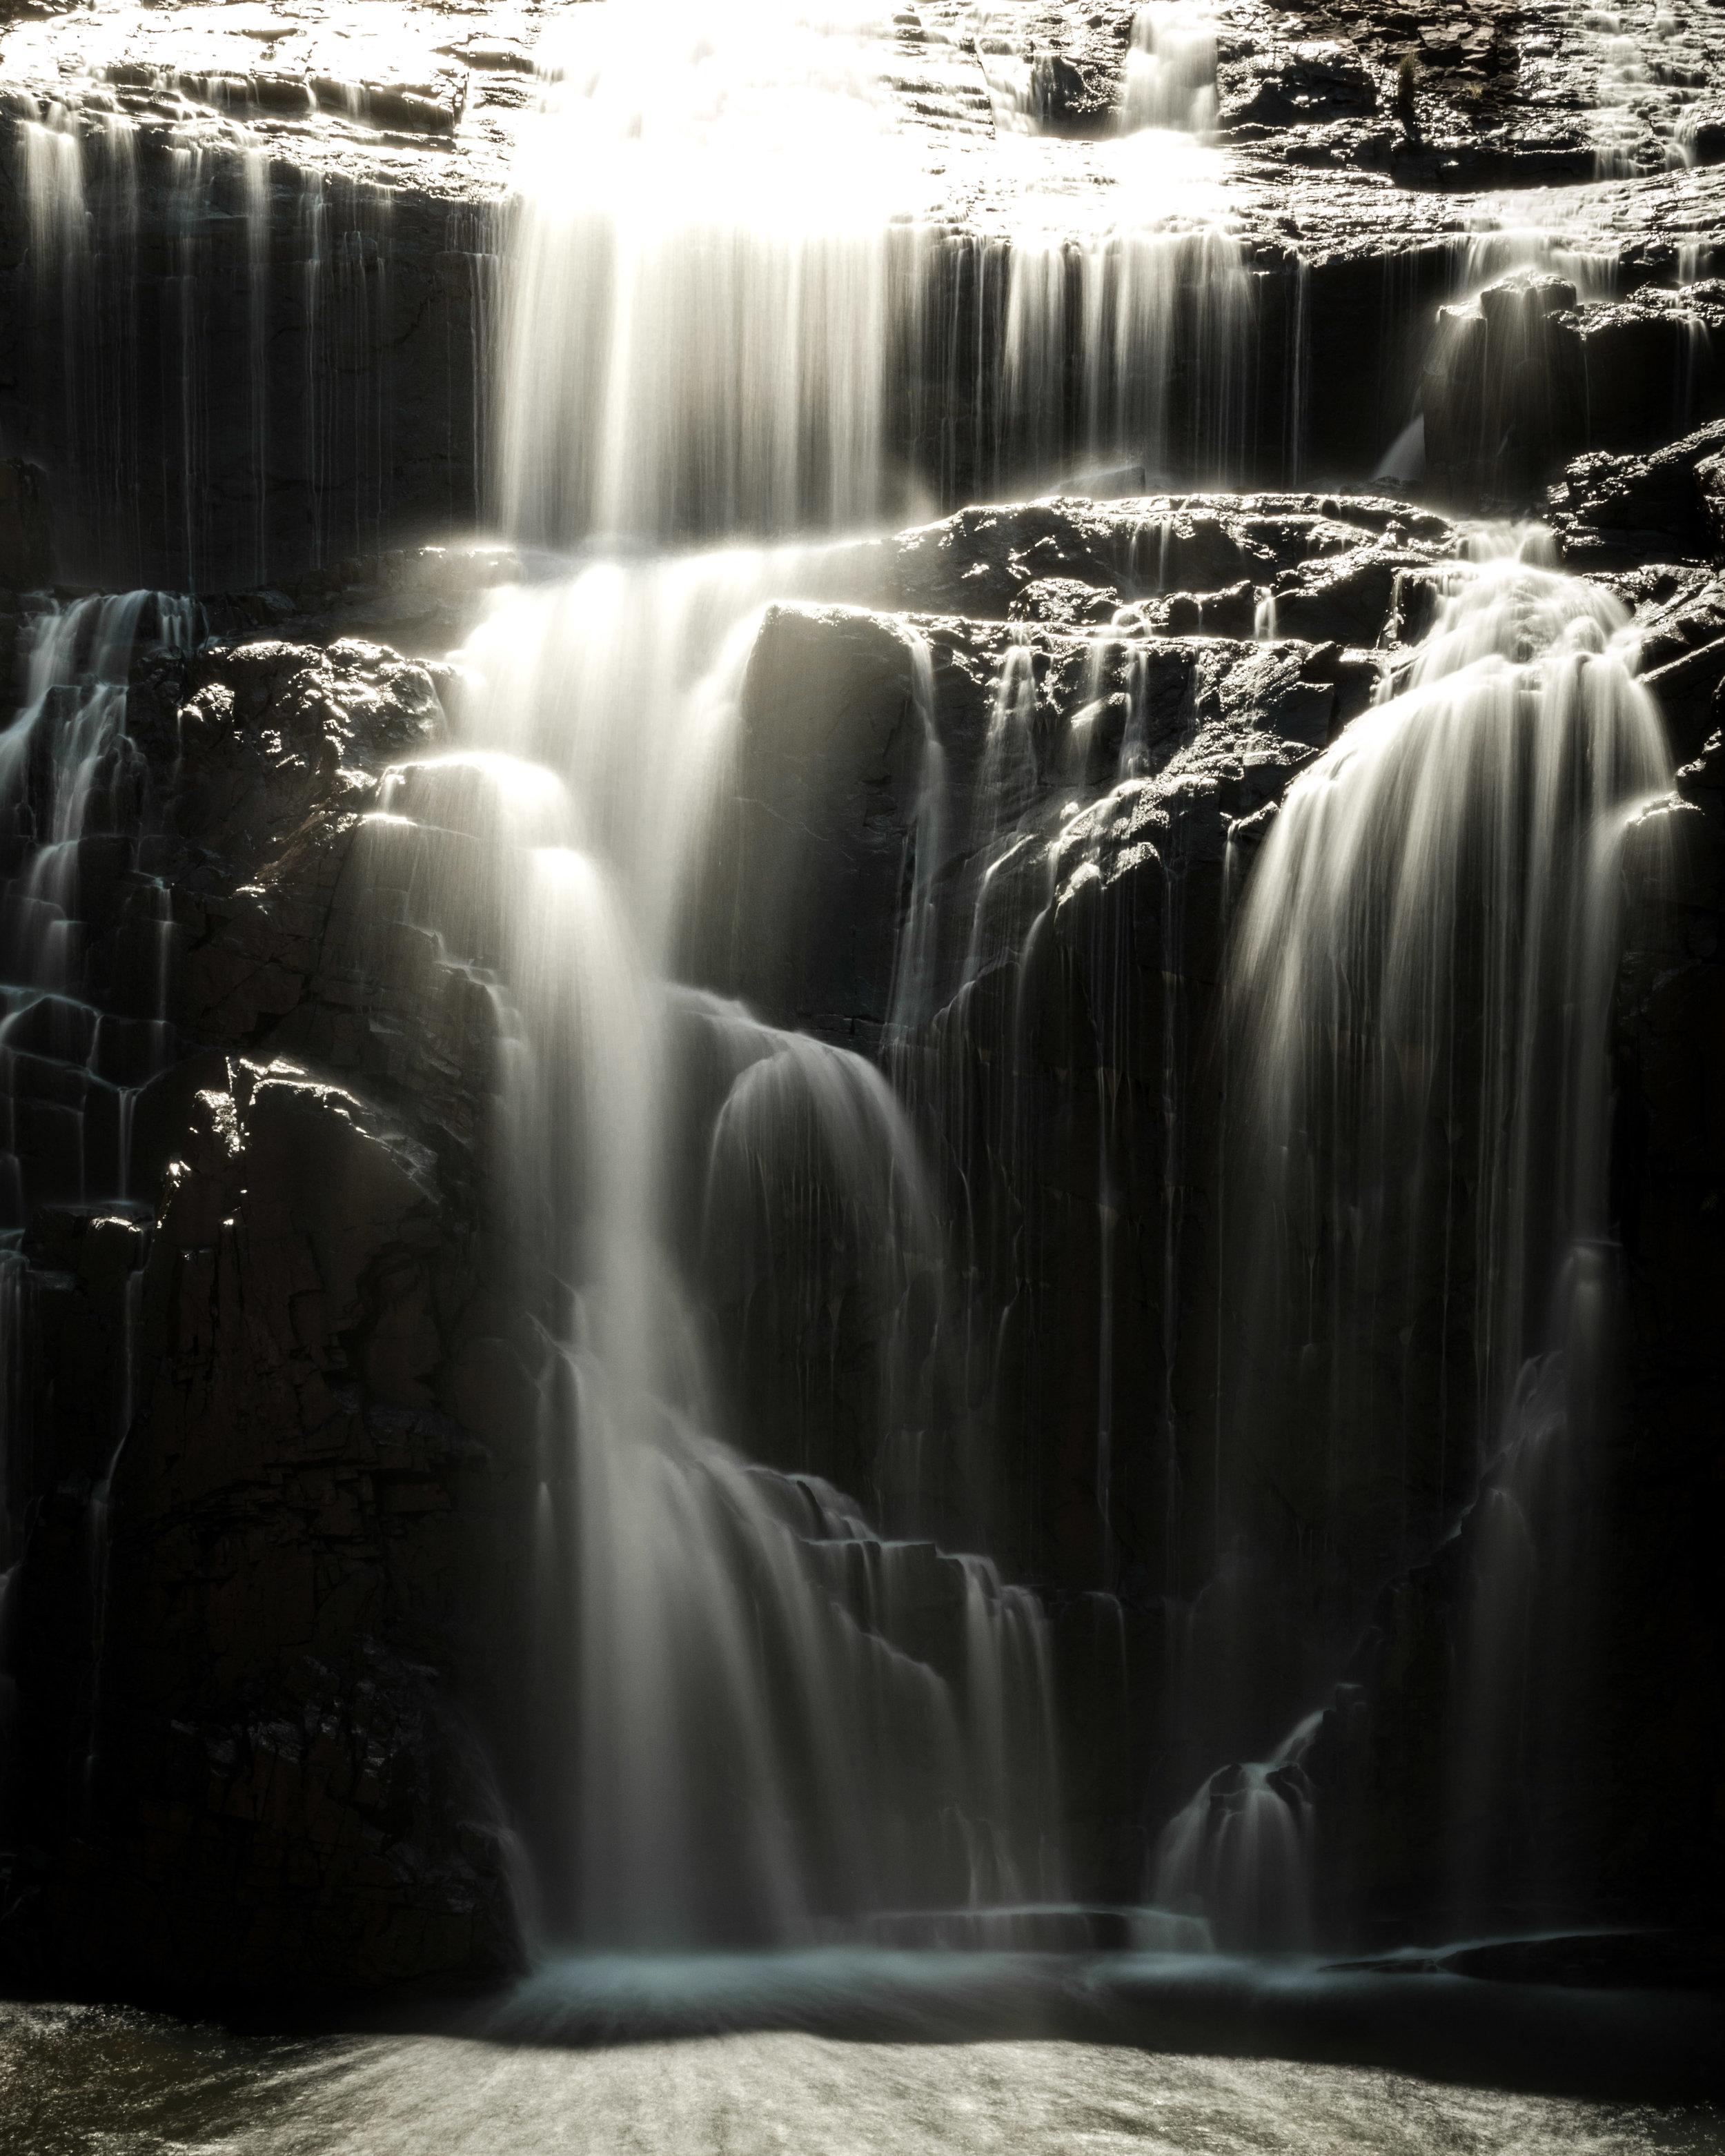 A Calming Feeling Sitting Below A Cascading Falls.